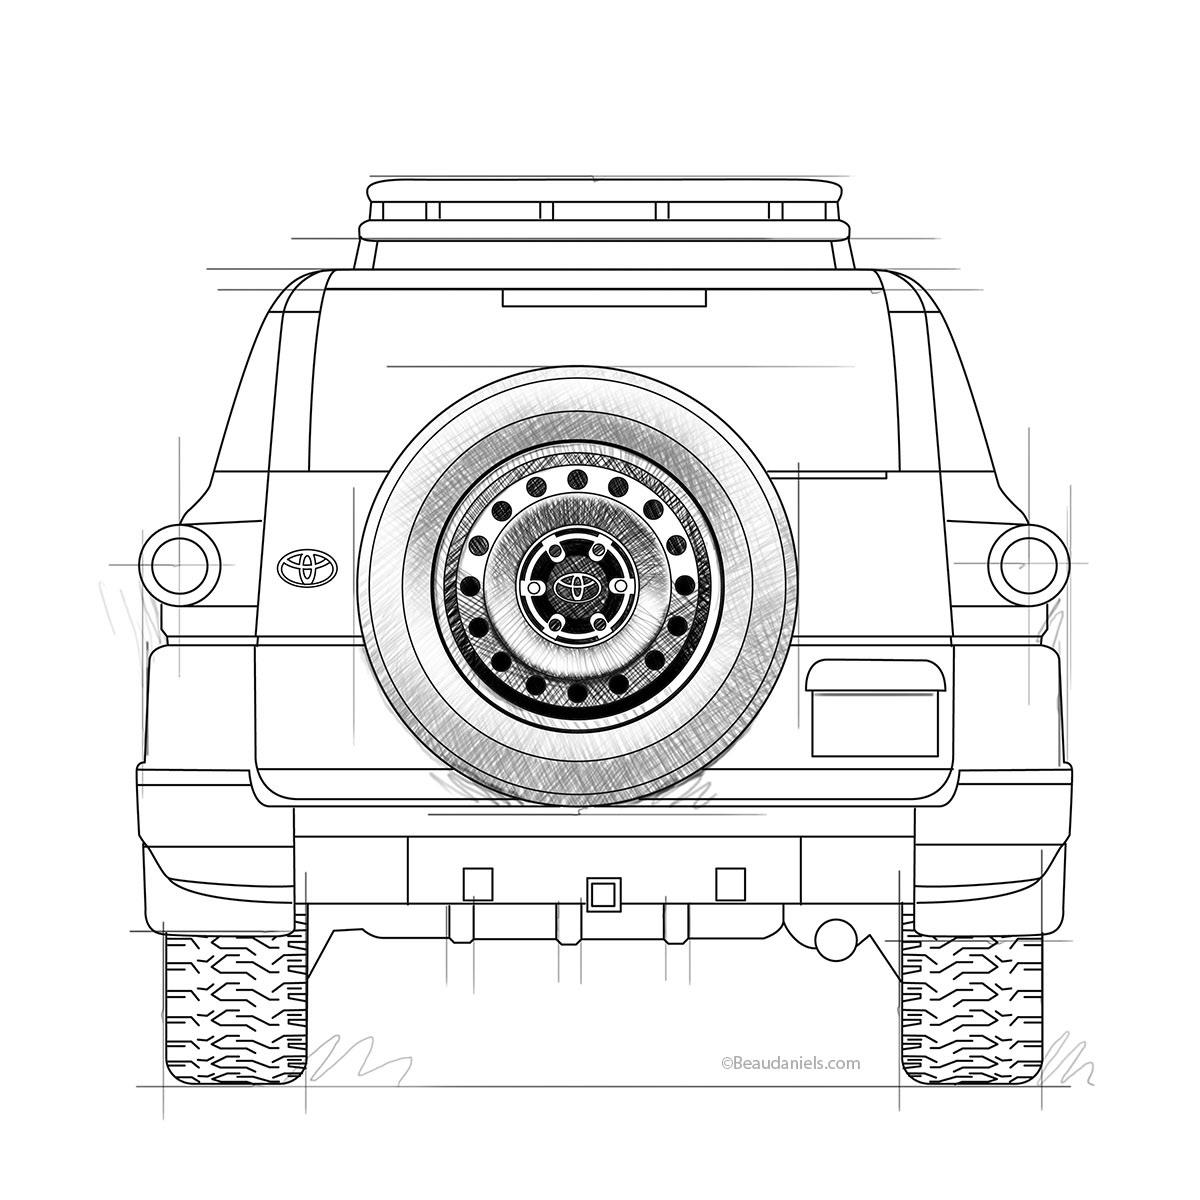 2017 Acura Mdx Sport Hybrid Transmission: Technical Illustration, Beau And Alan Daniels.